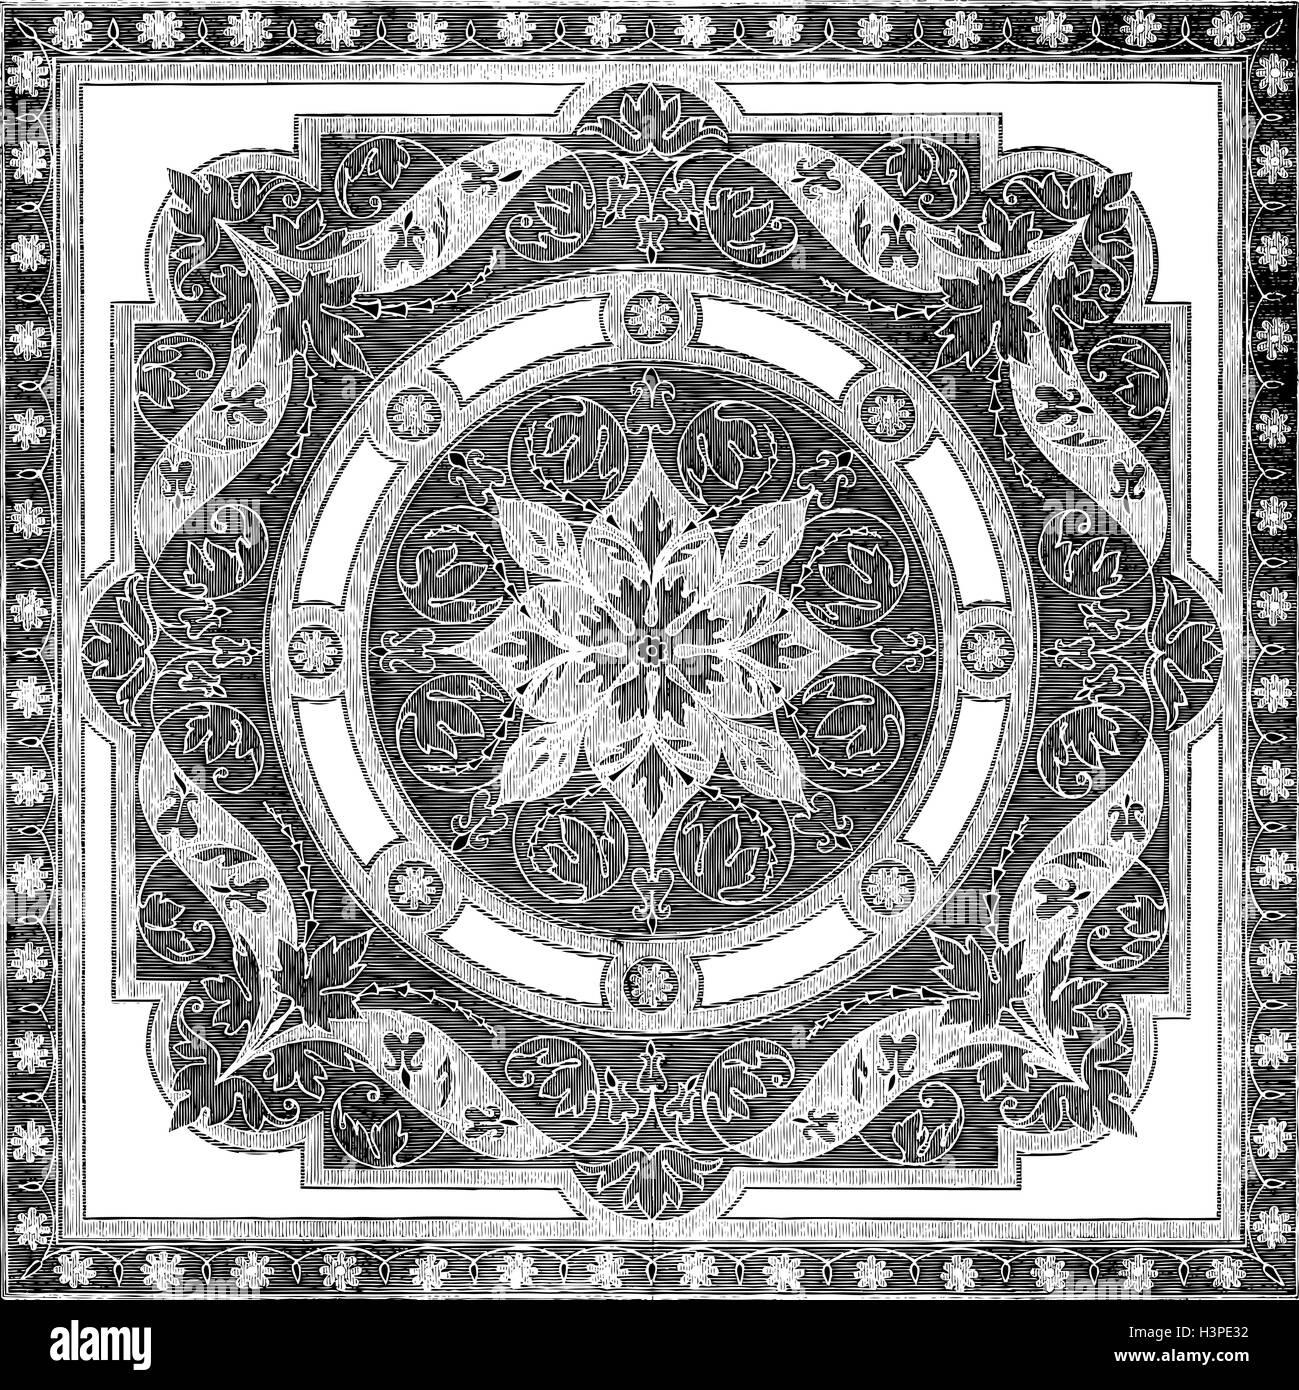 Abstrakten Floralen Mosaik Fliesen Vintage Ornament Nahtlose Vektor